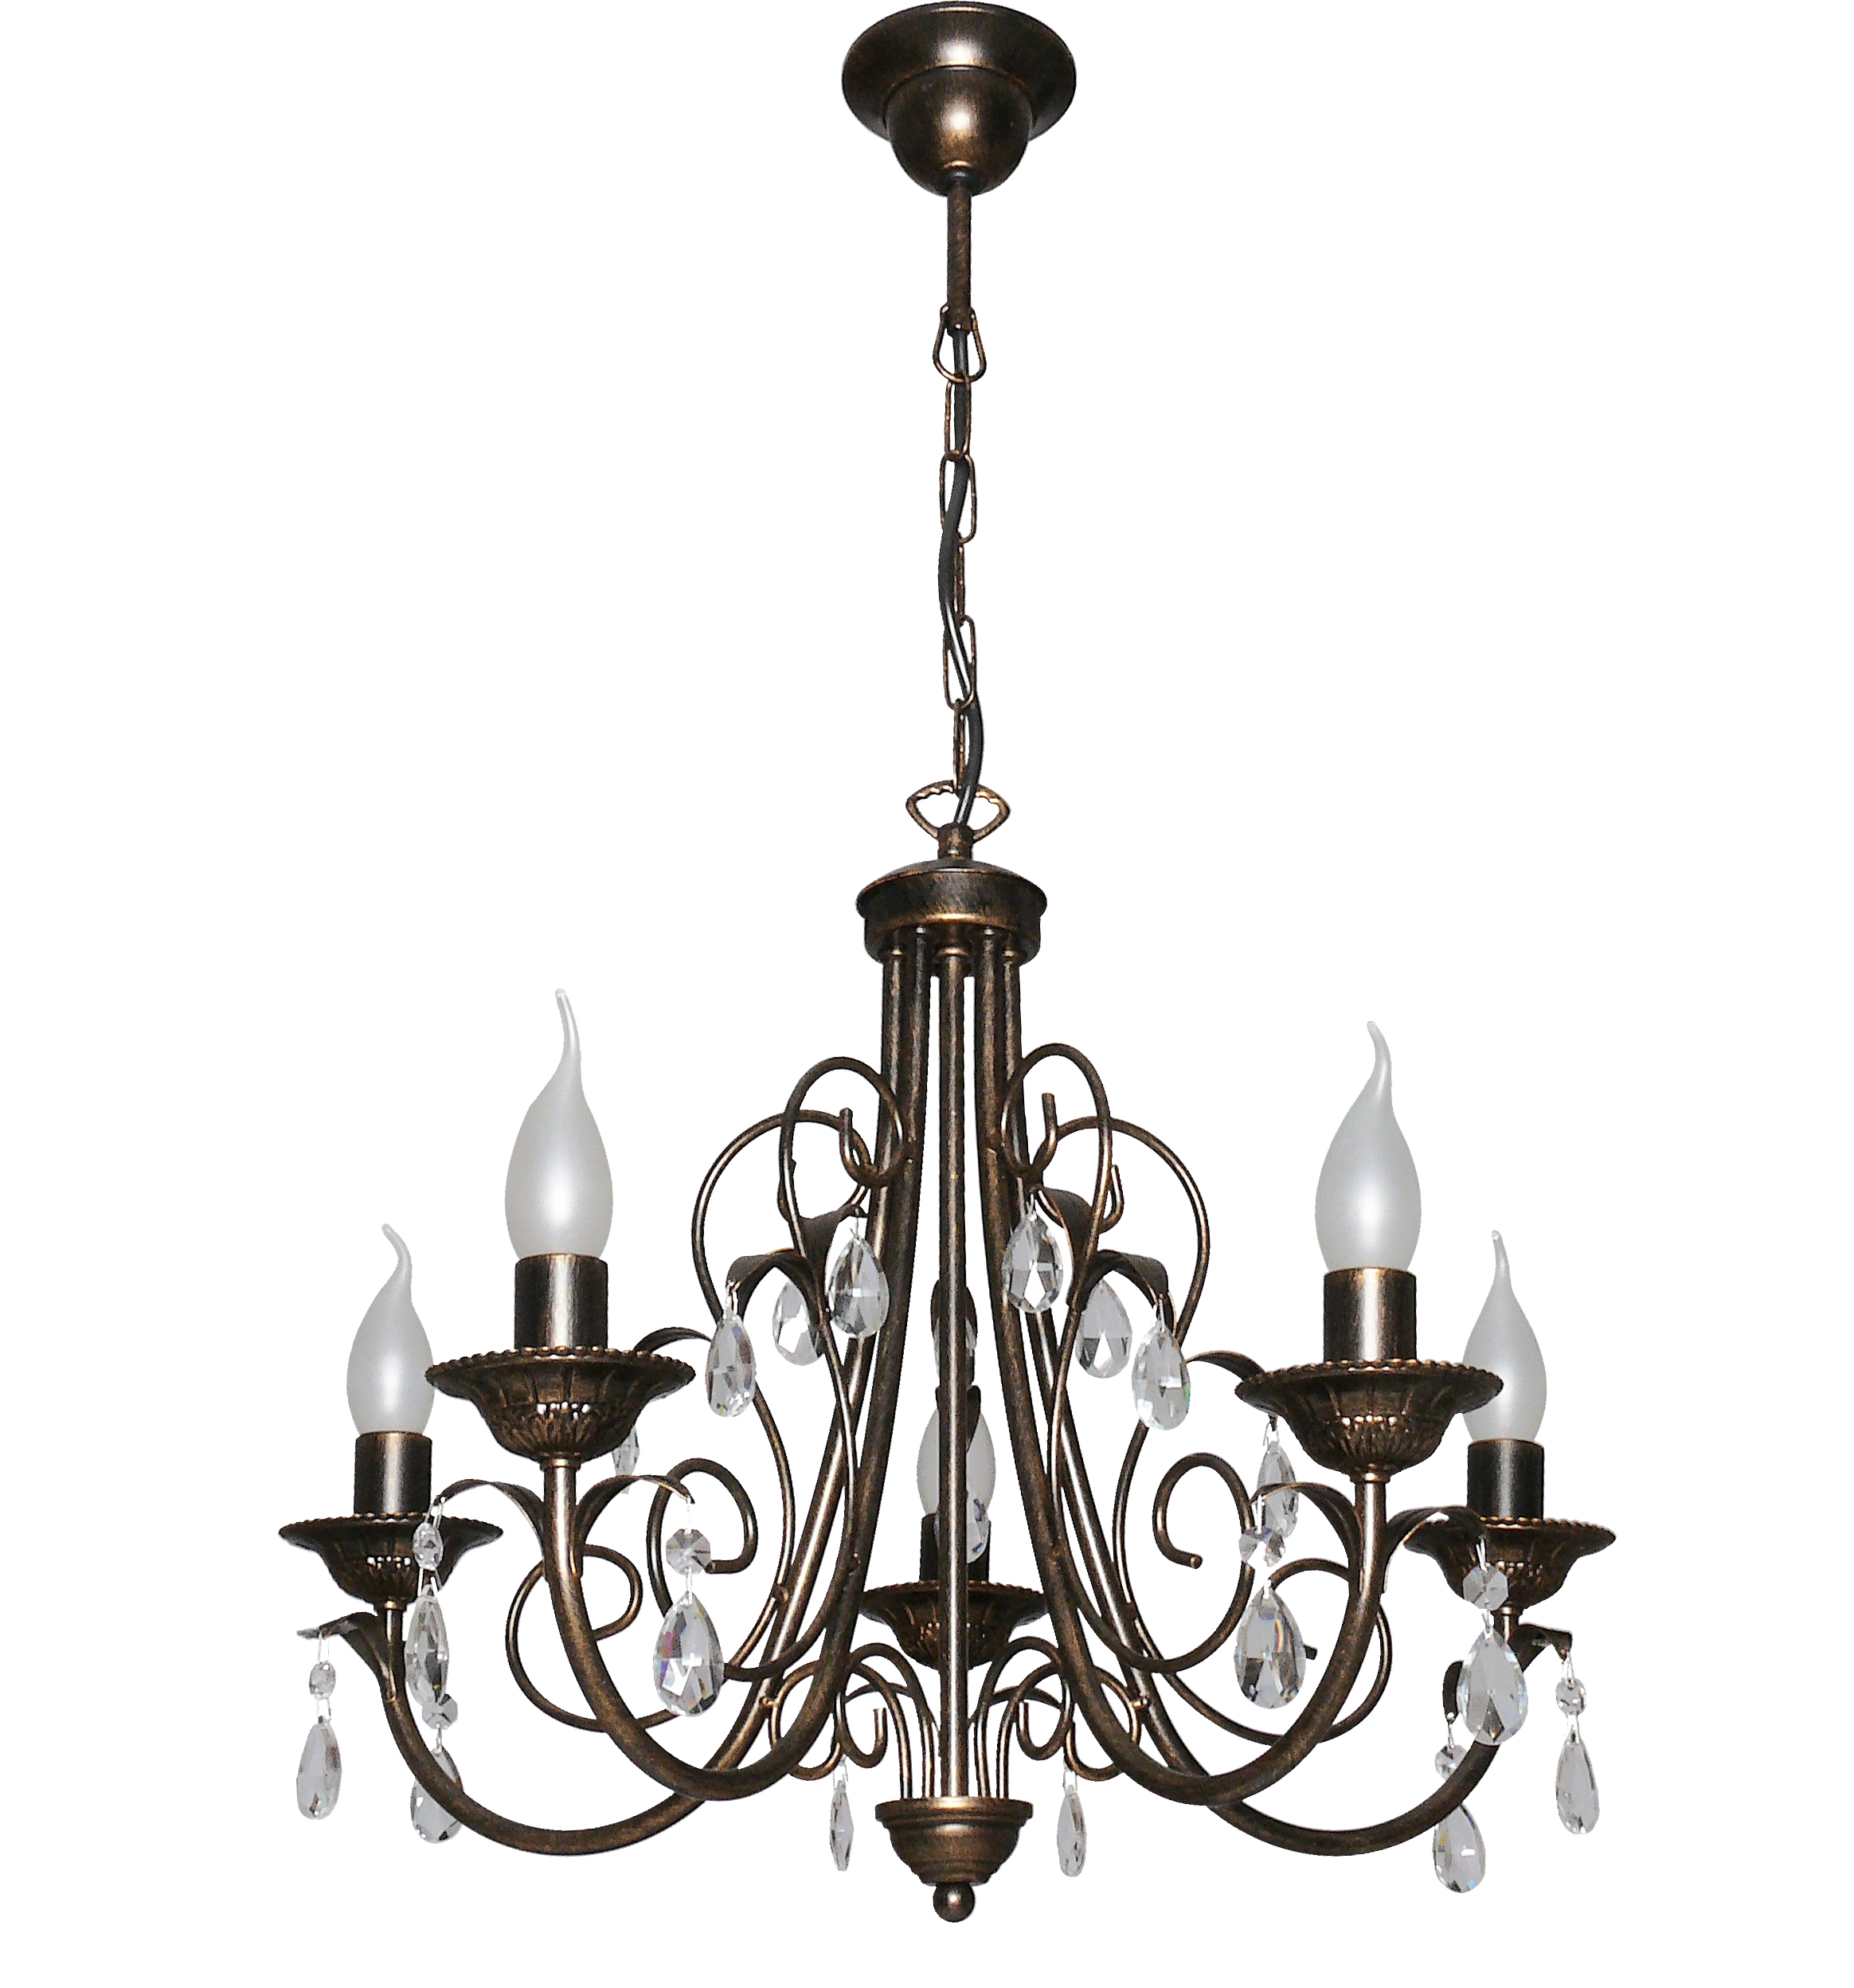 Люстра АВРОРА Муссон 10003-5l люстра lamplandia daria 3х40вт е14 металл темно коричневый